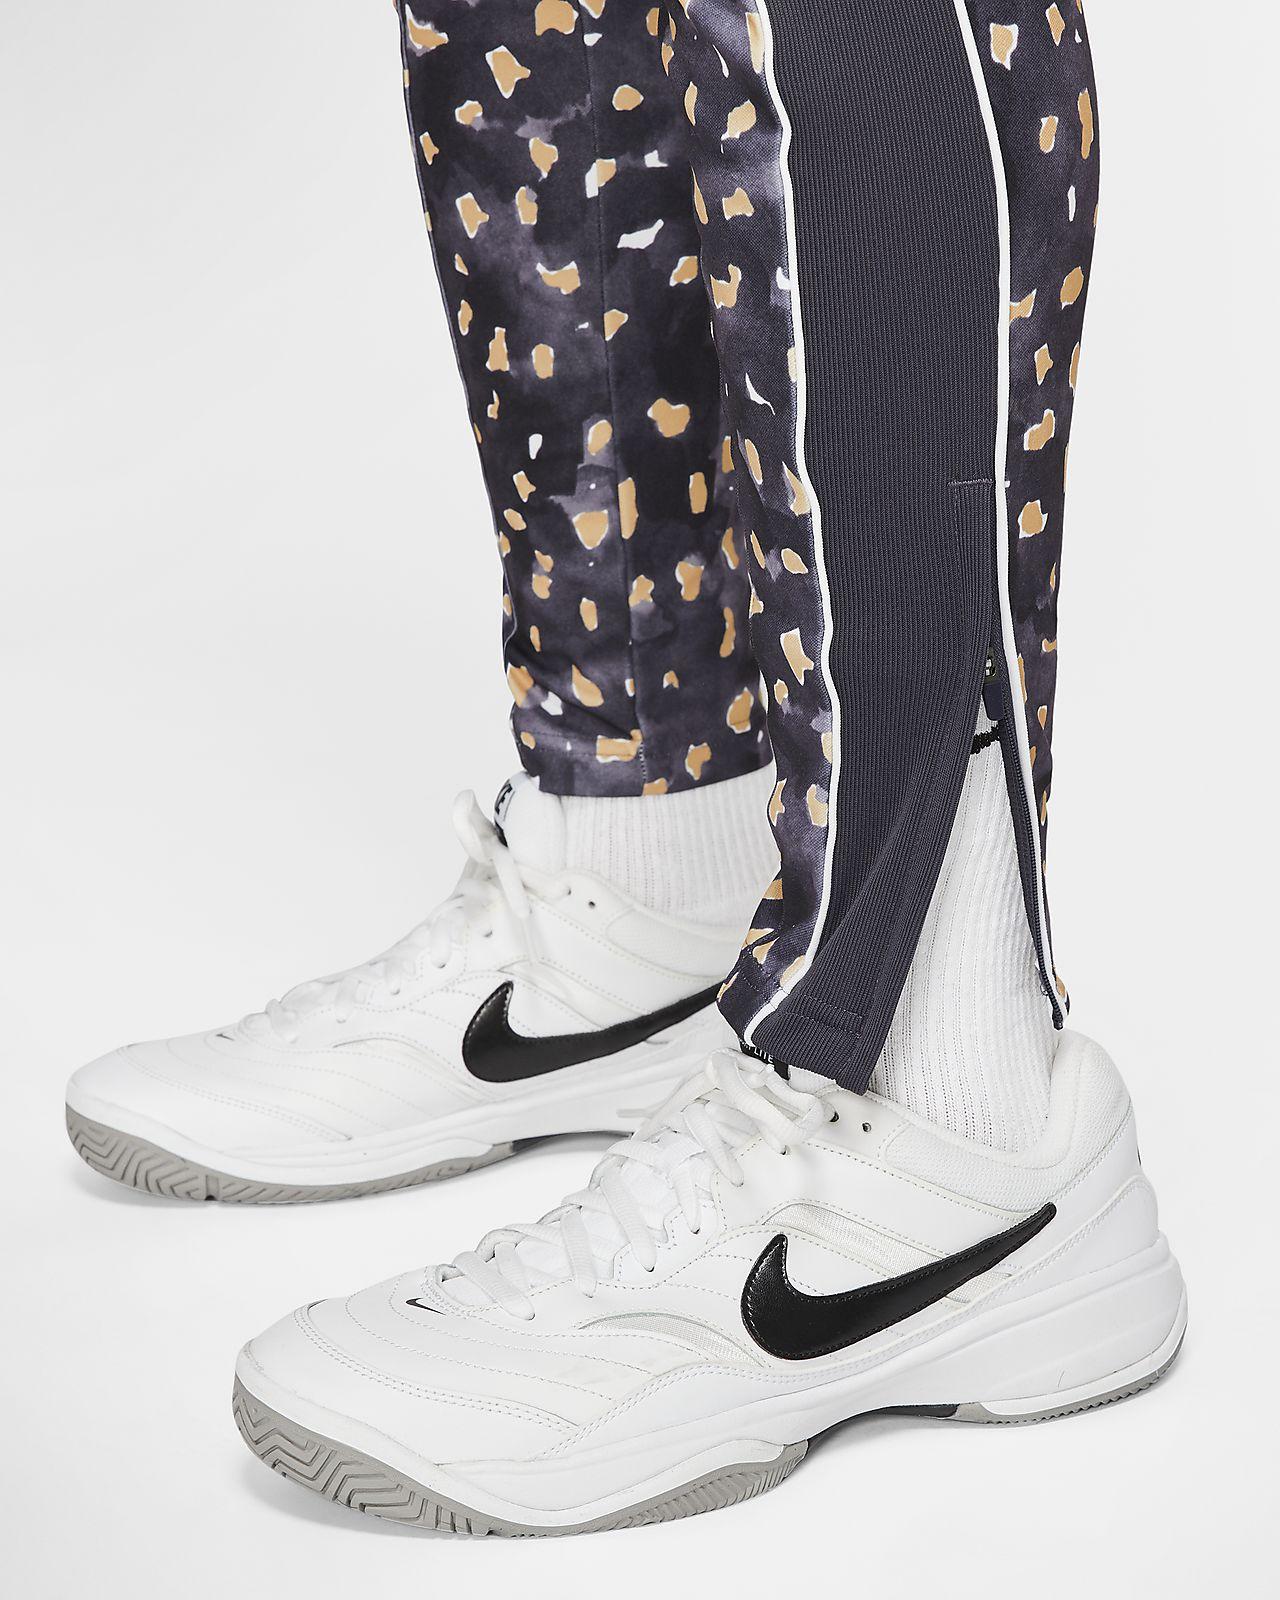 NikeCourt Men's Tennis Warm Up Pants